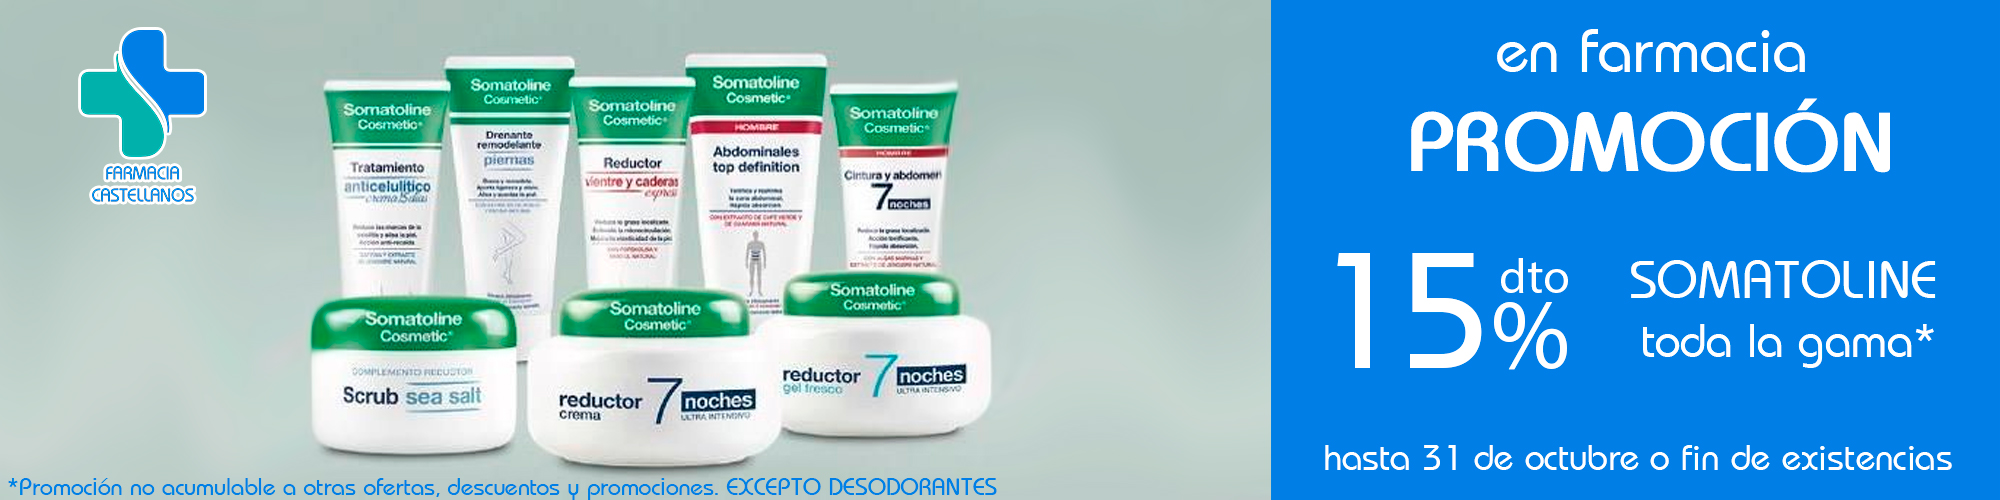 promocion-somatoline-oct-farmaciabeatrizcastellanos